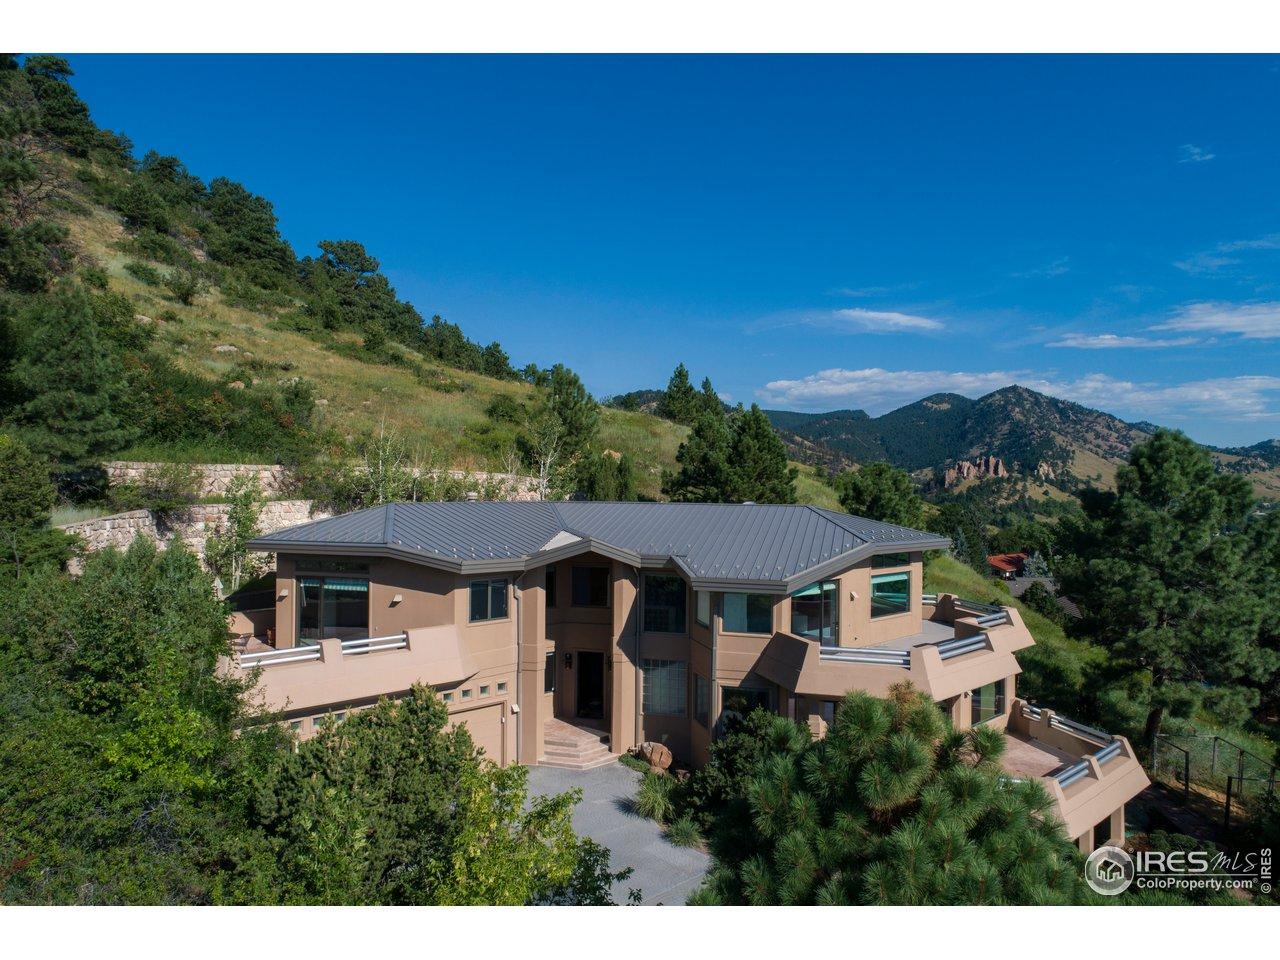 1065 5th St, Boulder CO 80302